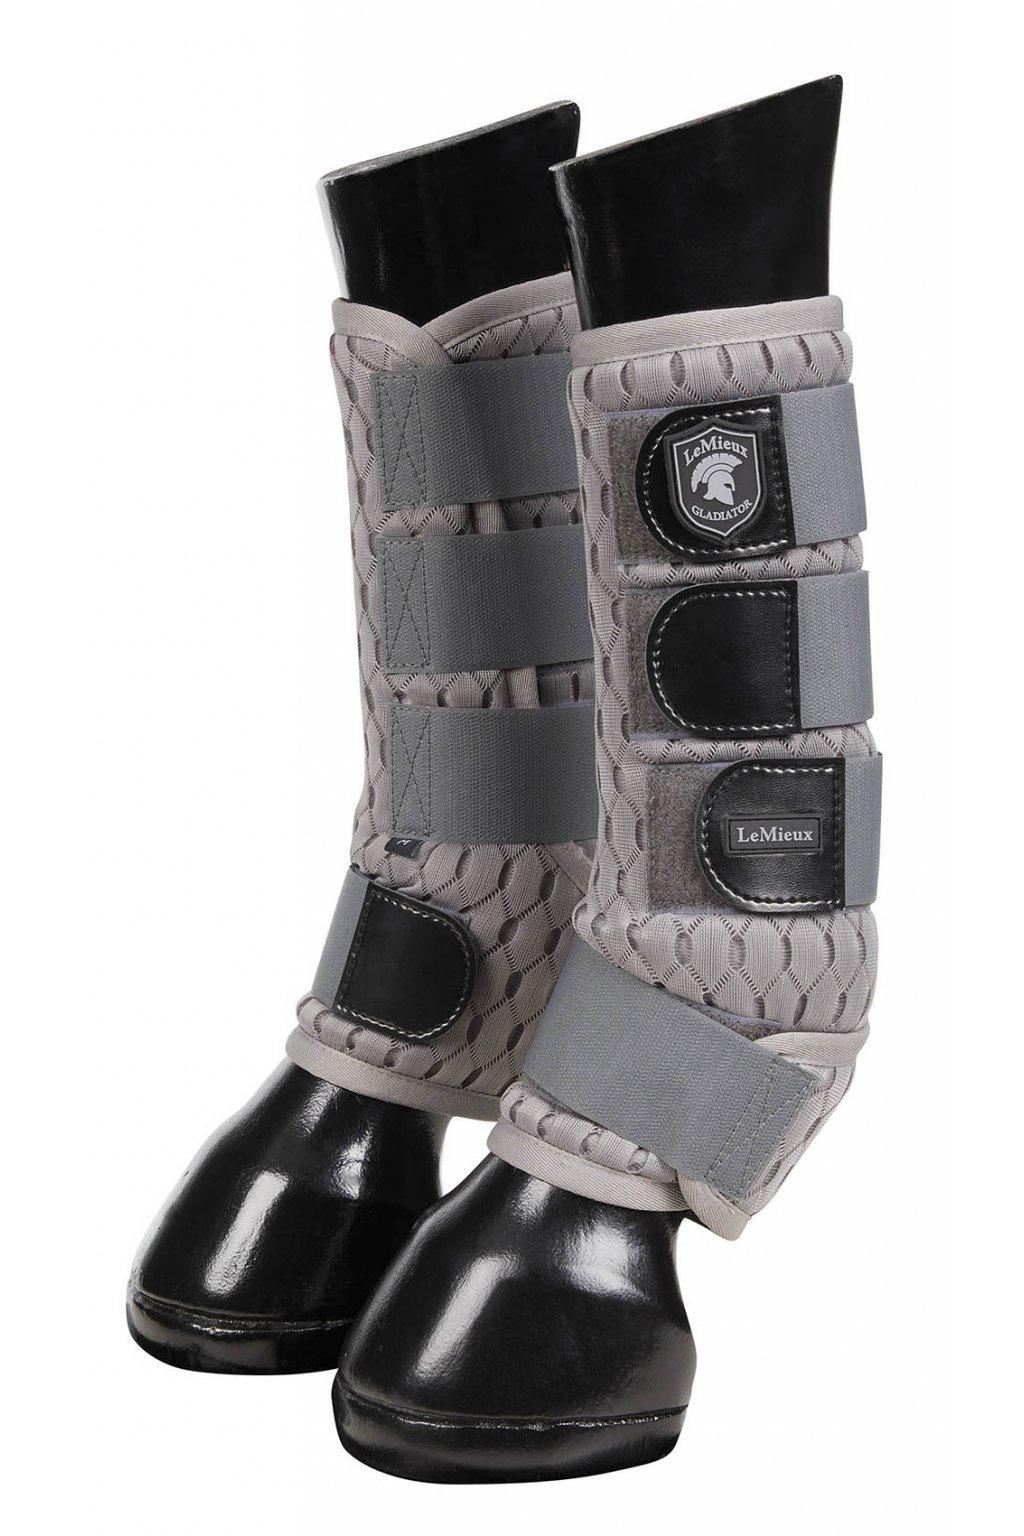 lm gladiatorboots1 lr